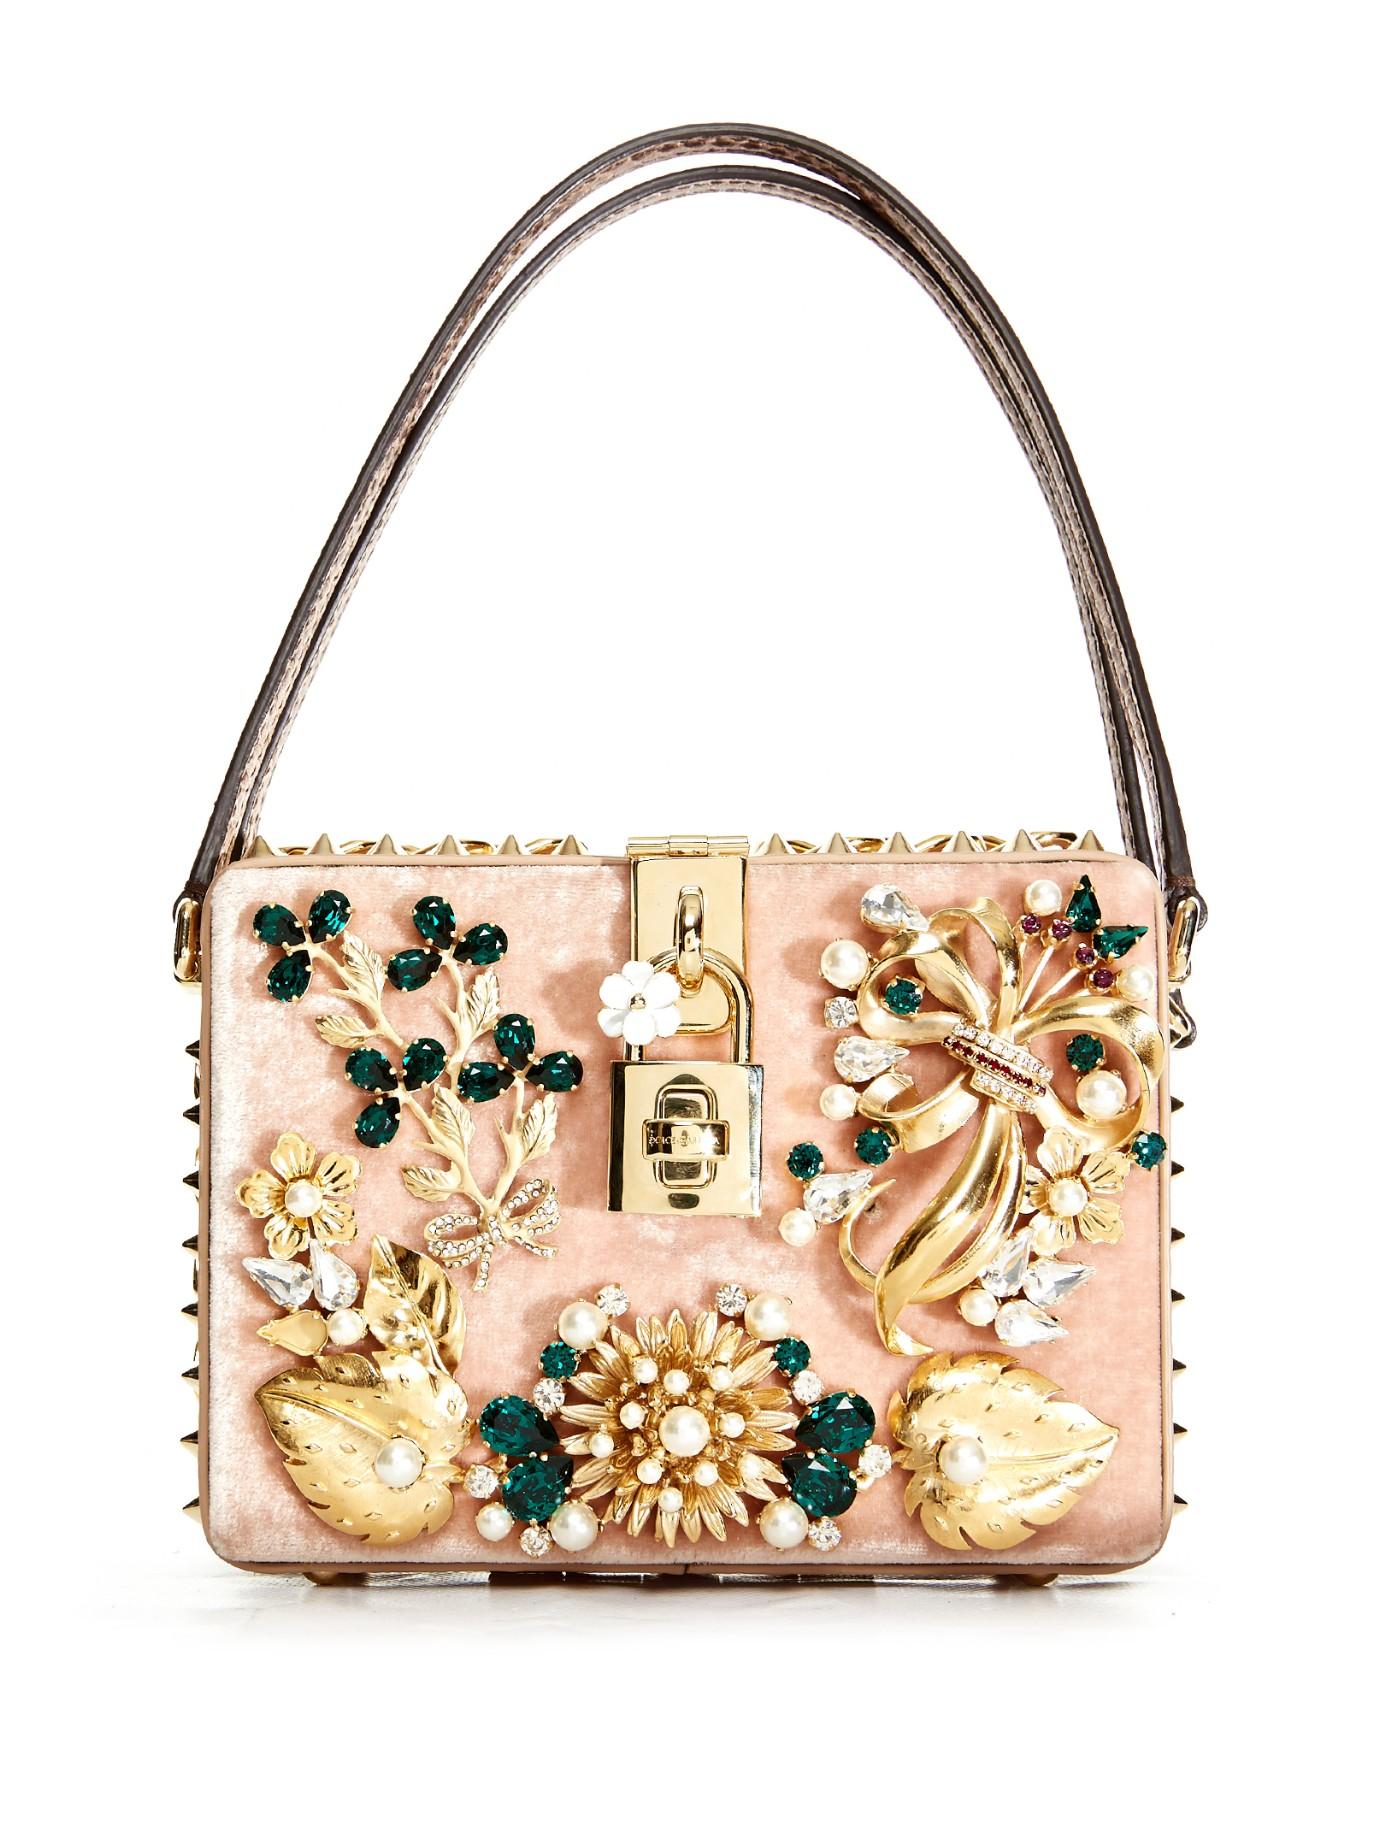 774b0de5d39d Dolce   Gabbana Dolce Mama Embellished Box Bag - Lyst